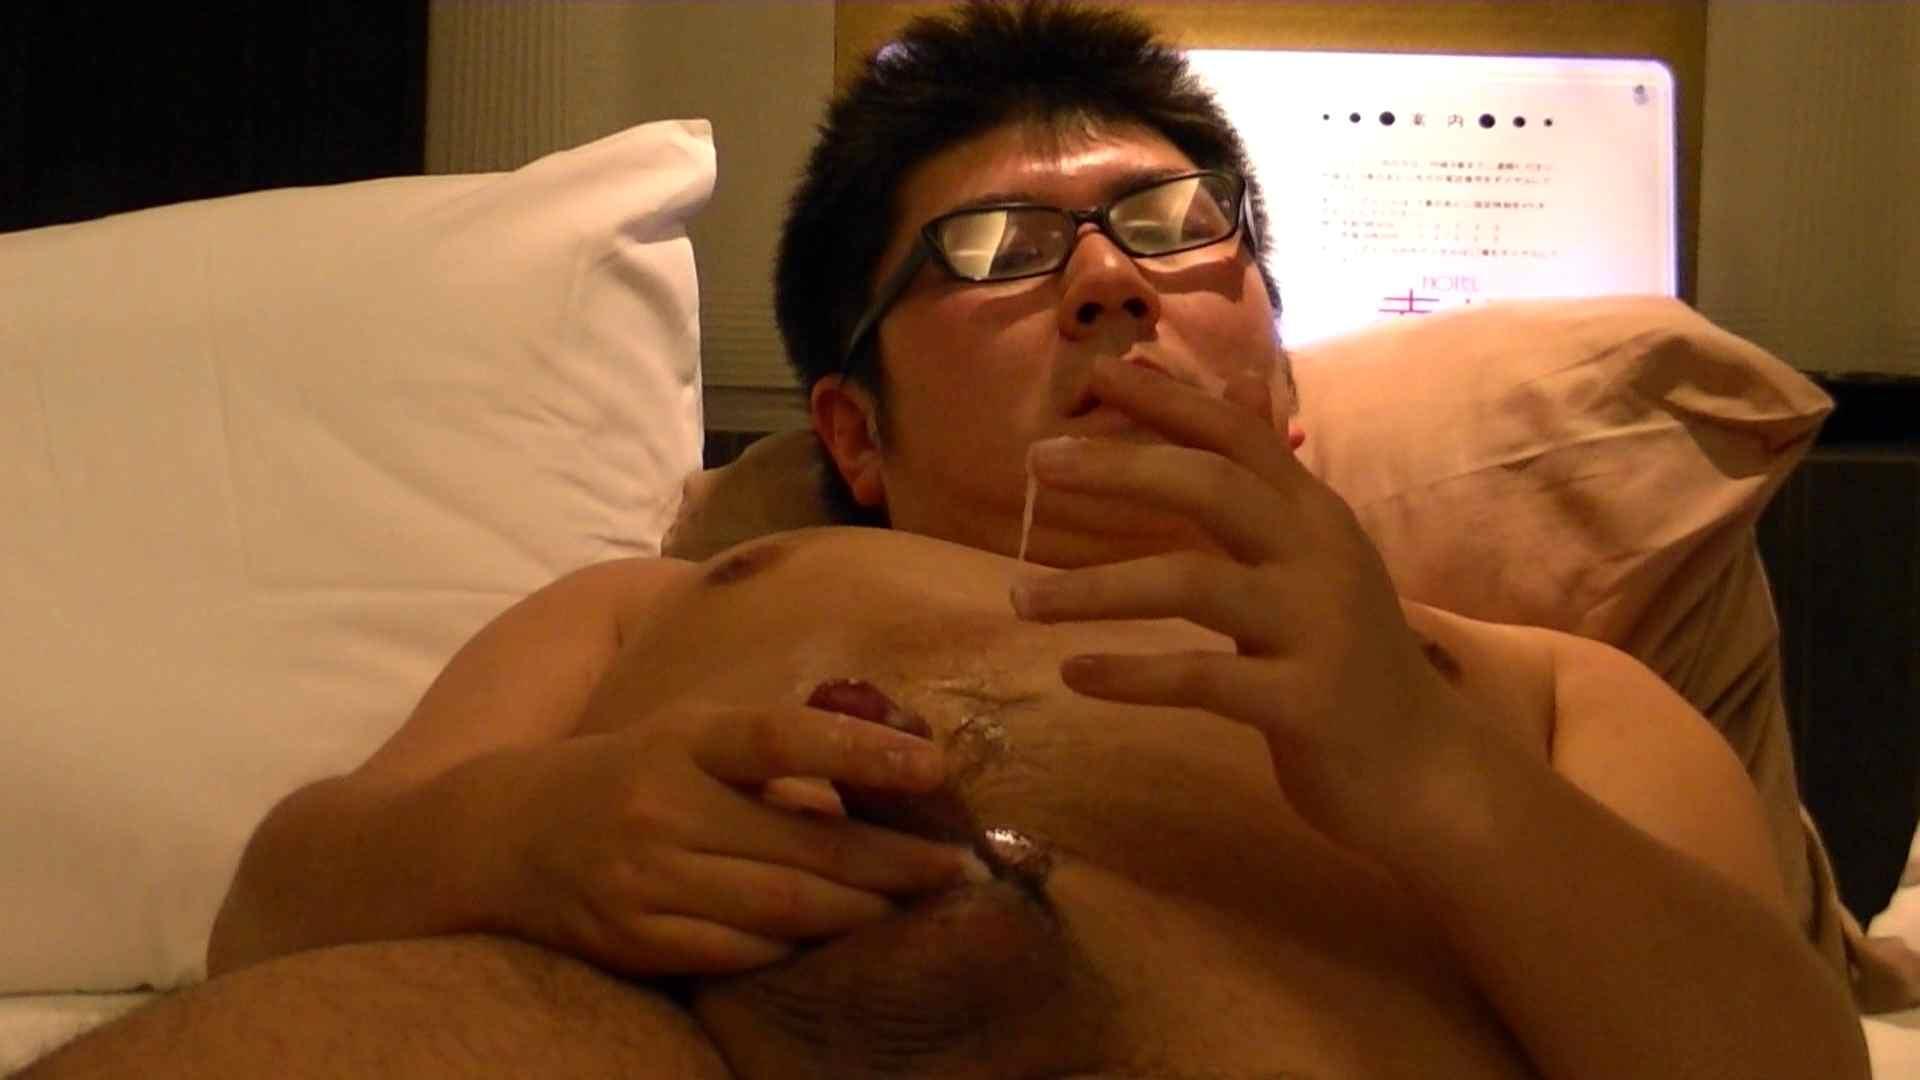 Mr.オナックスさん投稿!HD 貴方のオナニー三万円で撮影させてください。VOL.03 後編 完全無修正でお届け | オナニー特集  83pic 19